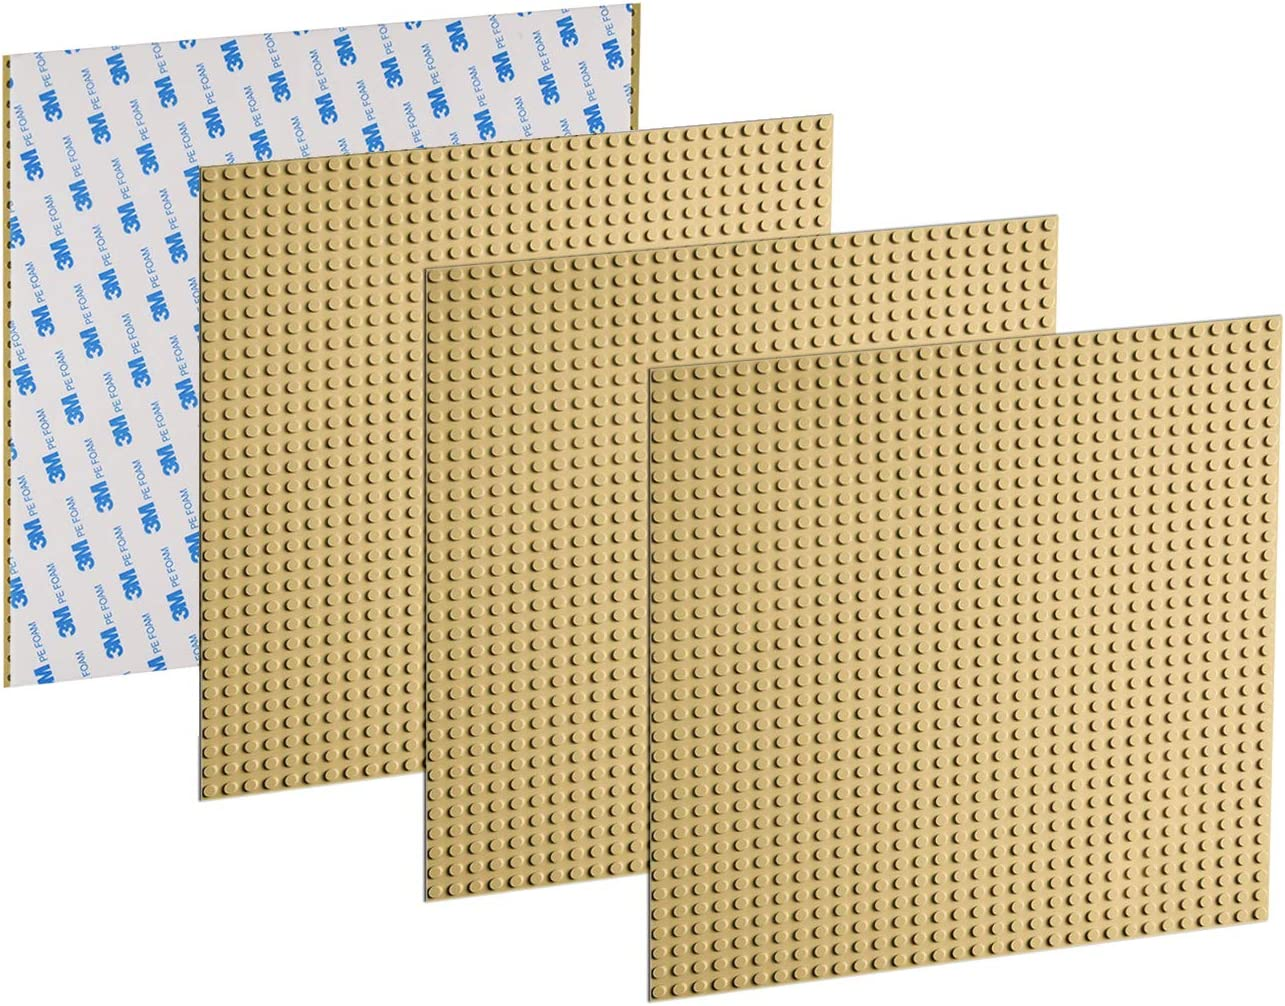 Green EKIND 6 PCS Self Adhesive Classic Building Brick Plate 10 x 10 Compatible with Building Brickyard Blocks All Major Brands